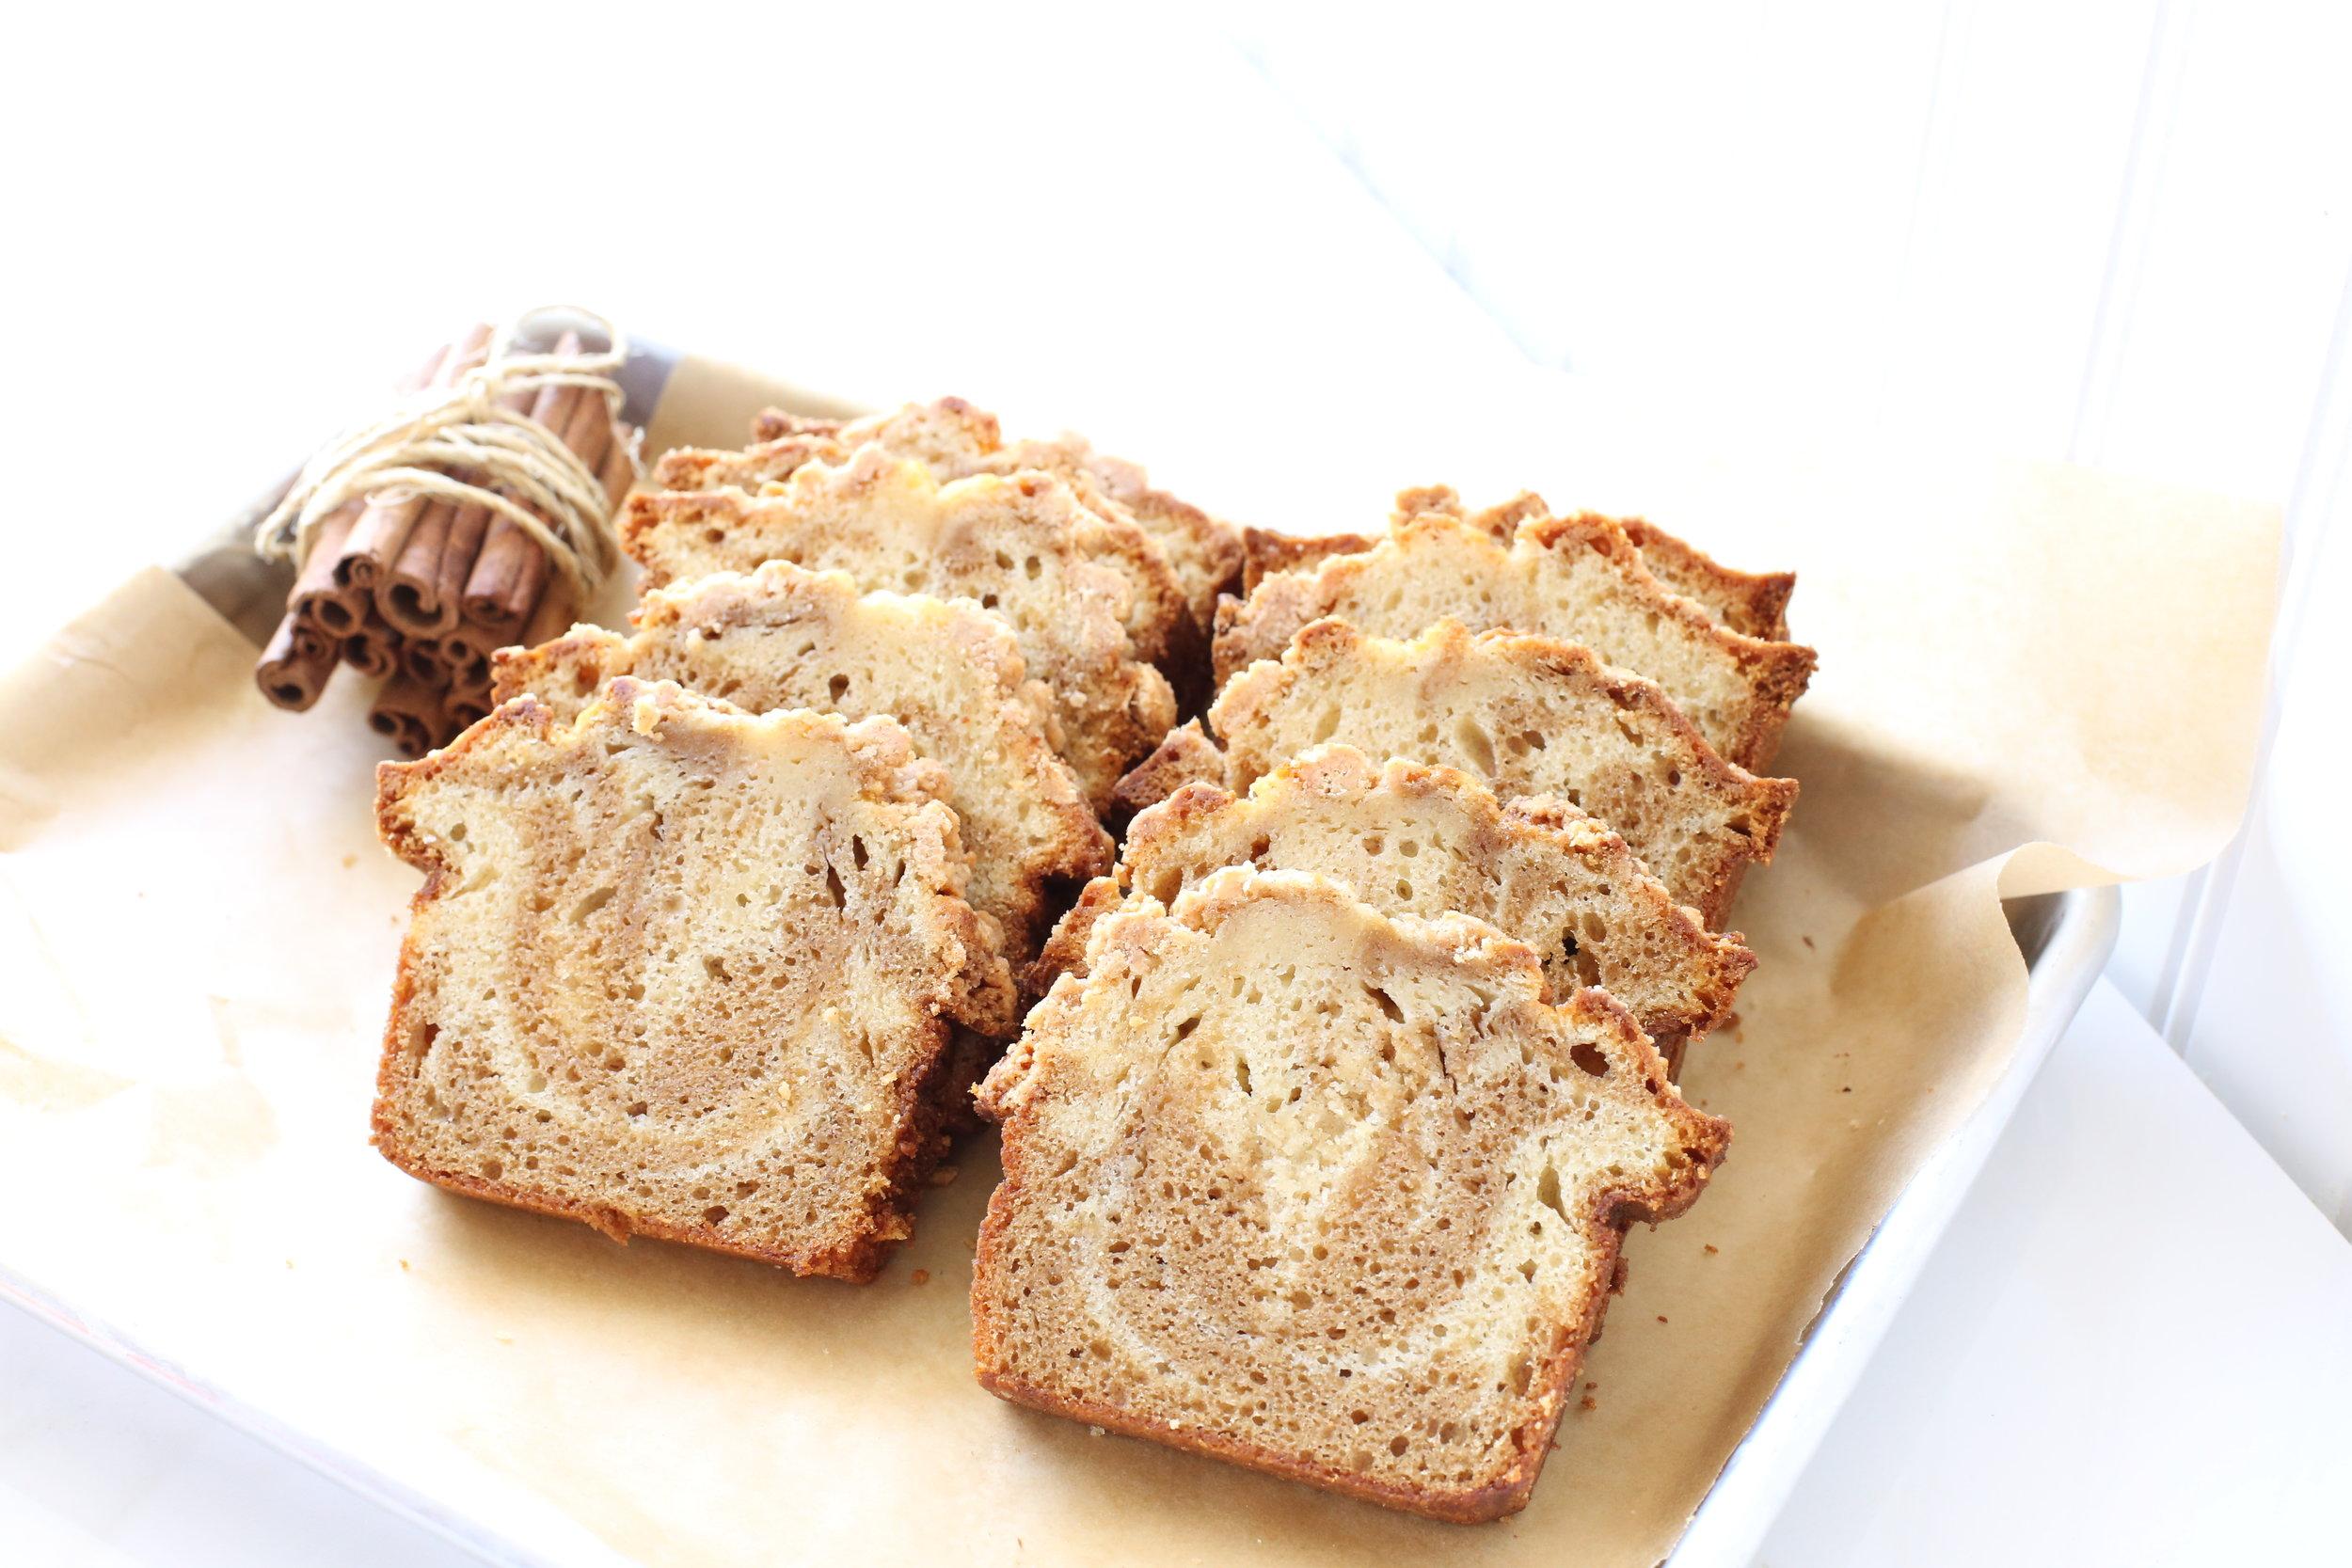 Mrs. Wonderful's Cakes™ - Cinnamon Swirl Loaf Cake